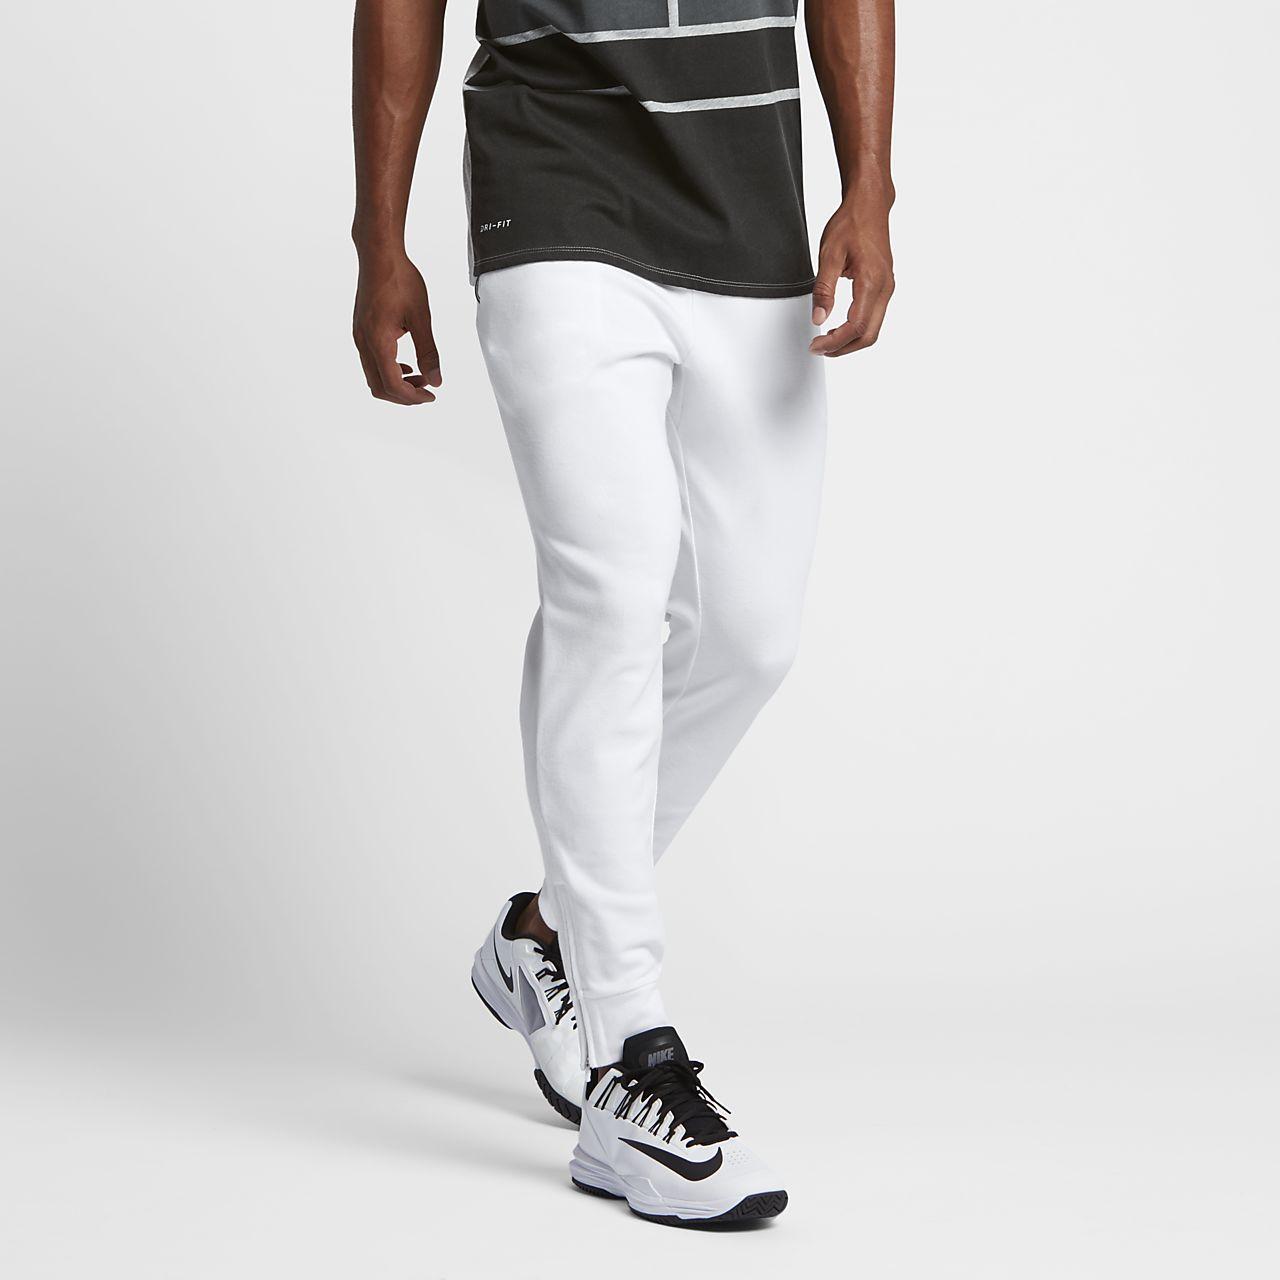 nike tennis trousers